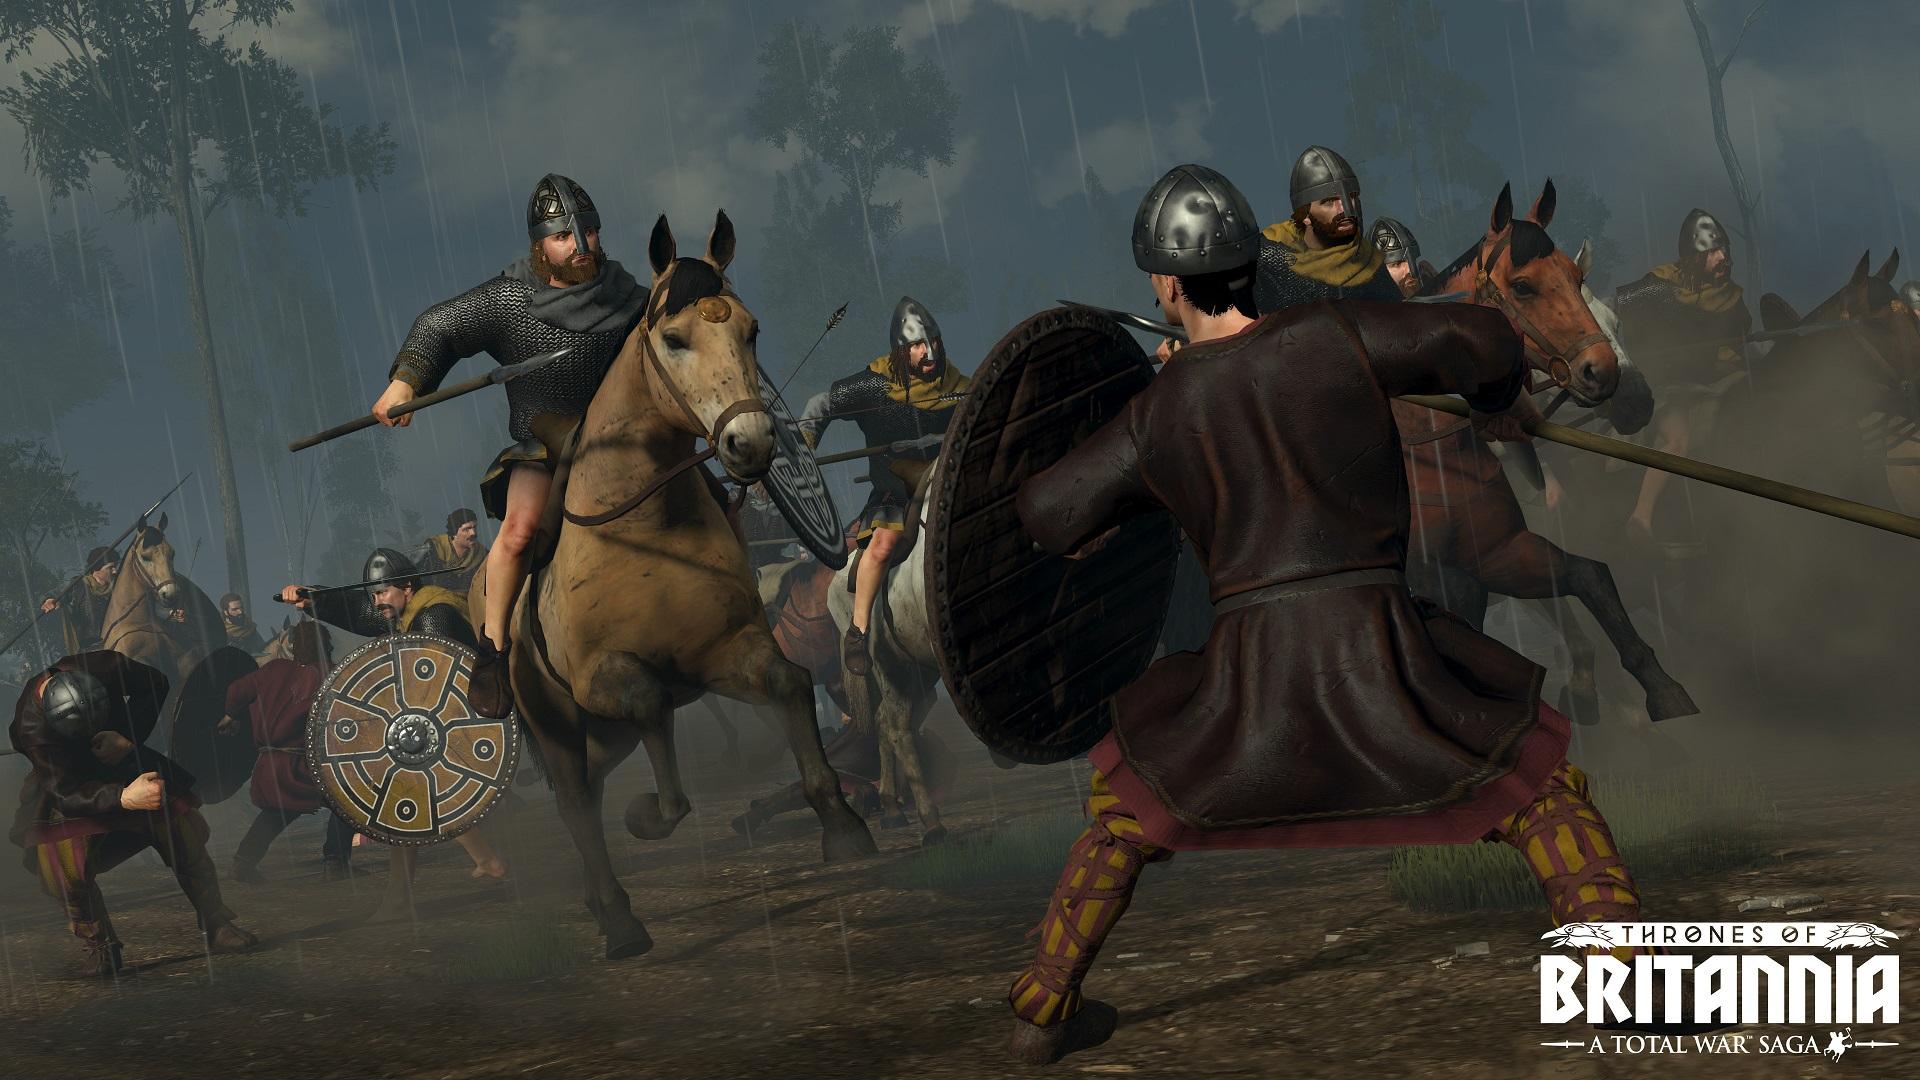 total war saga: thrones of britannia release date